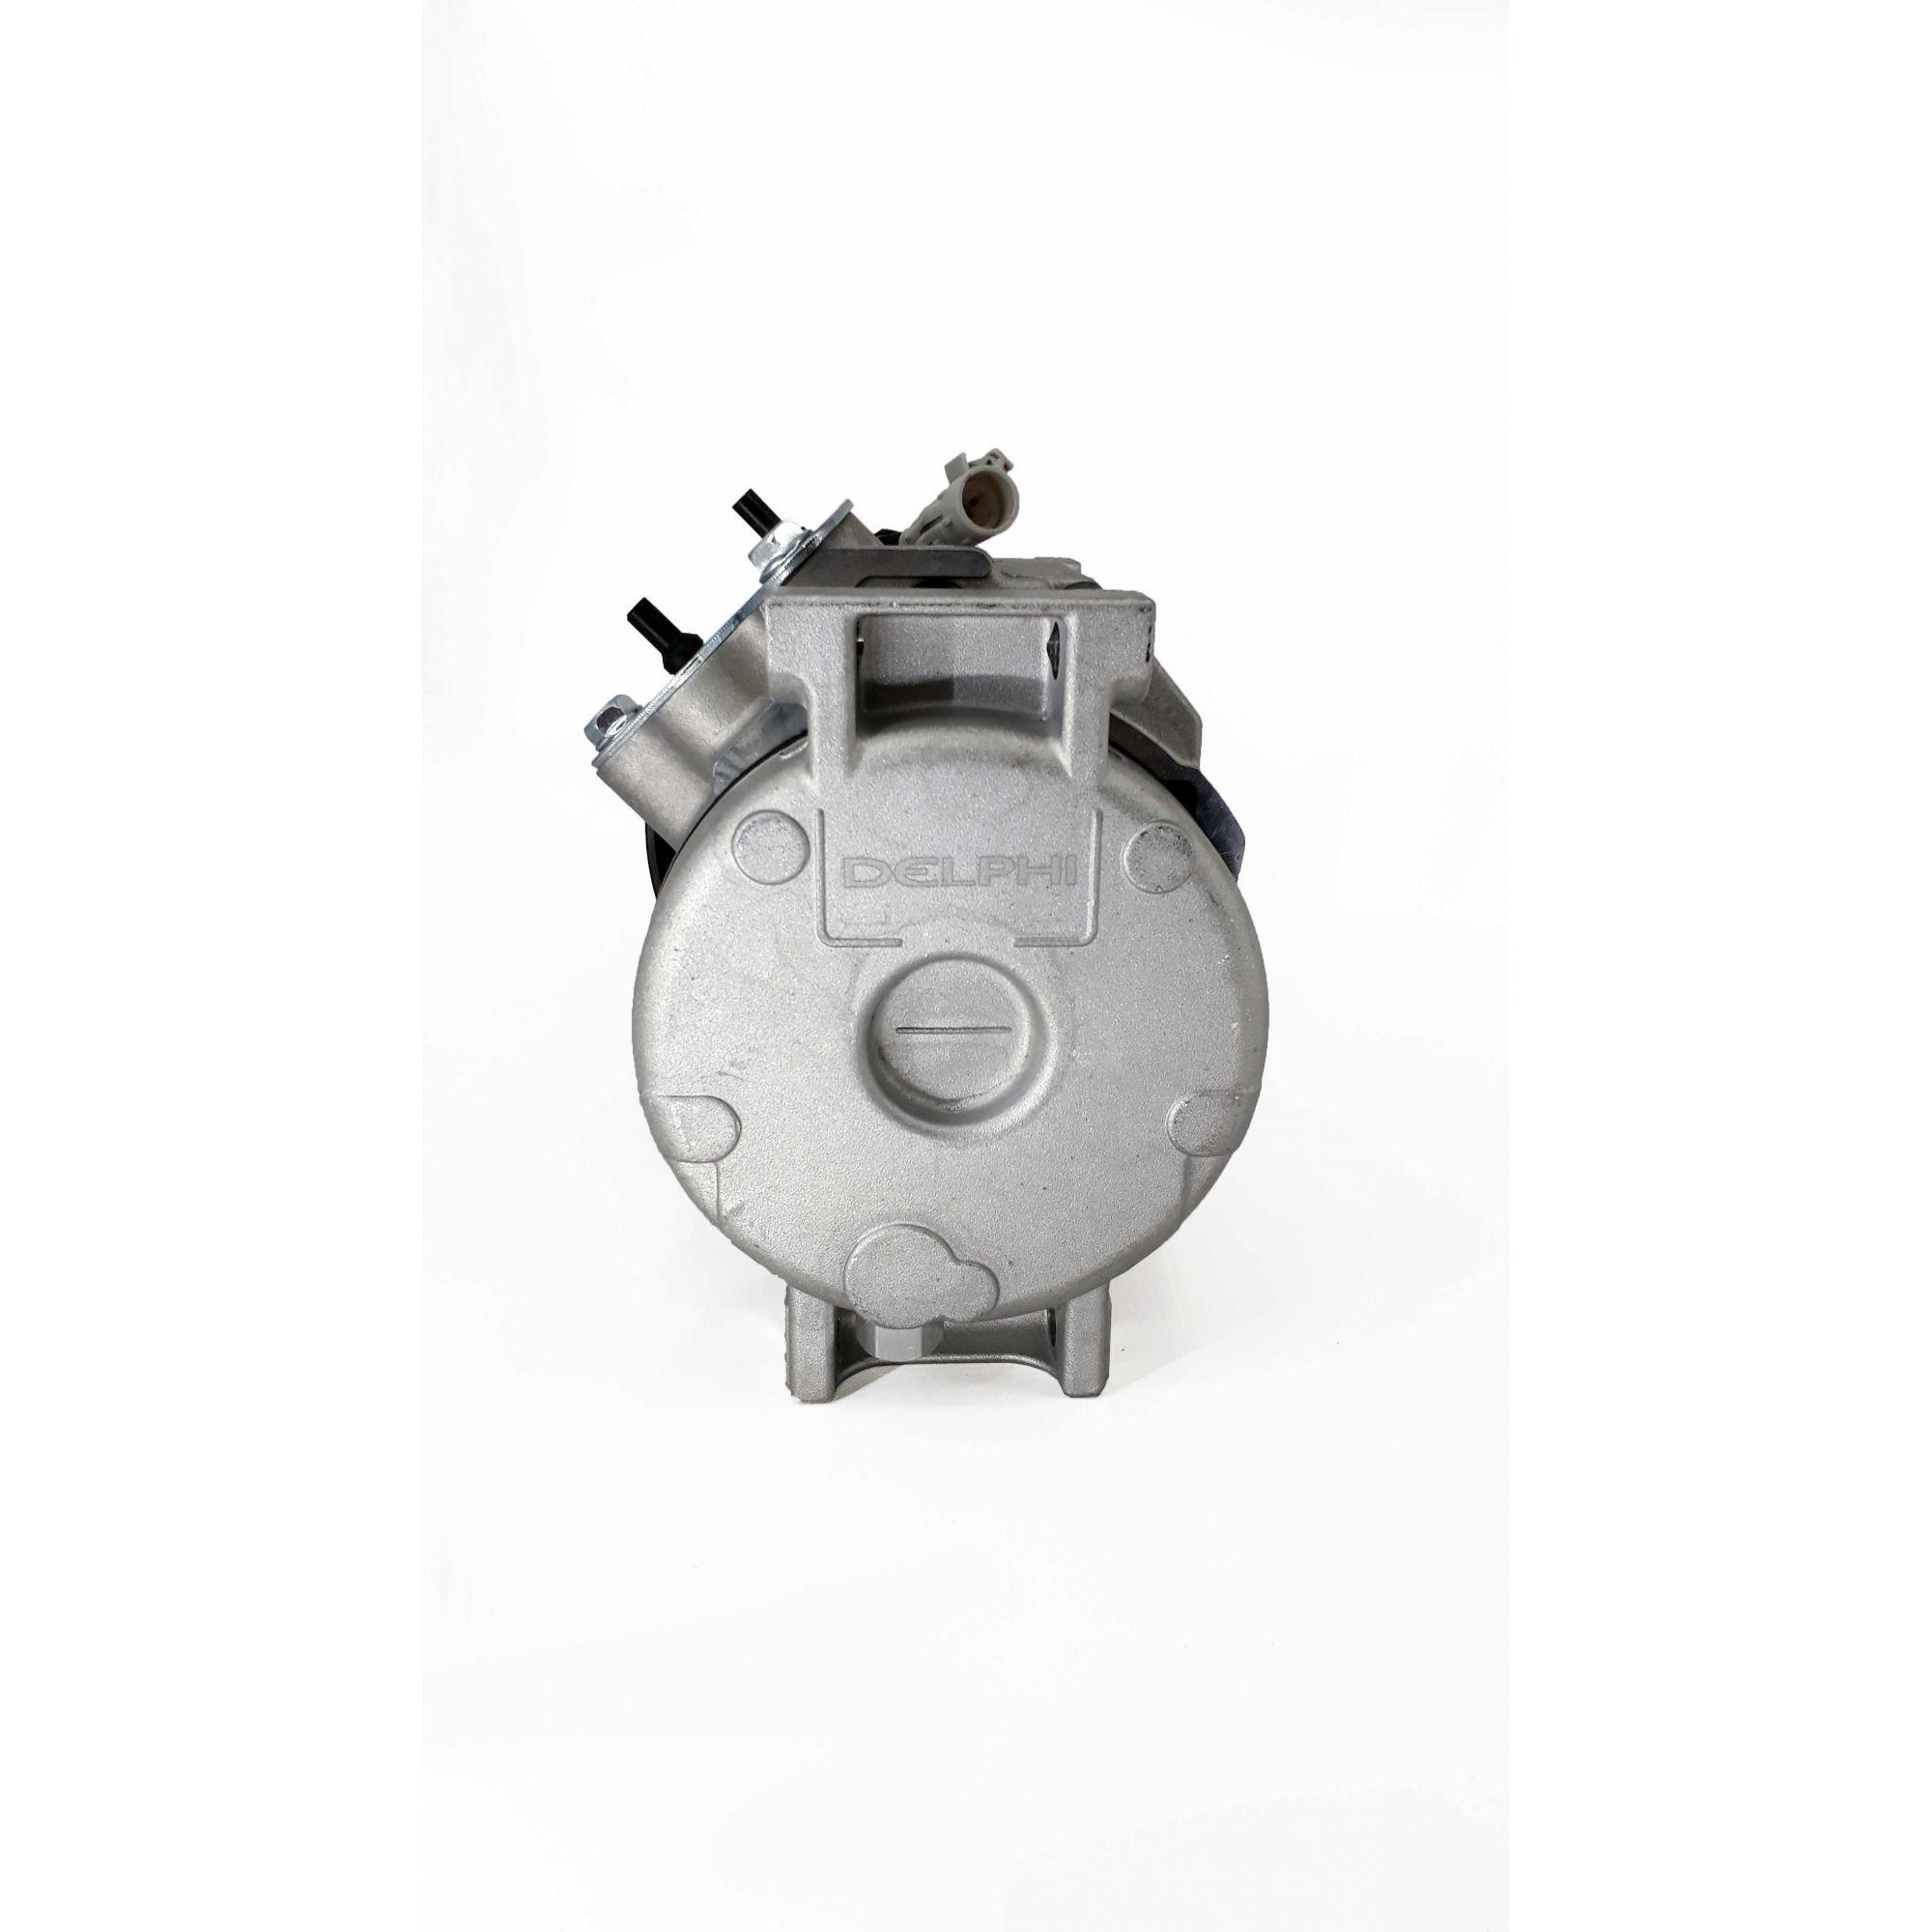 Compressor Corolla 1.8 2008 / 2009 - Original DELPHI